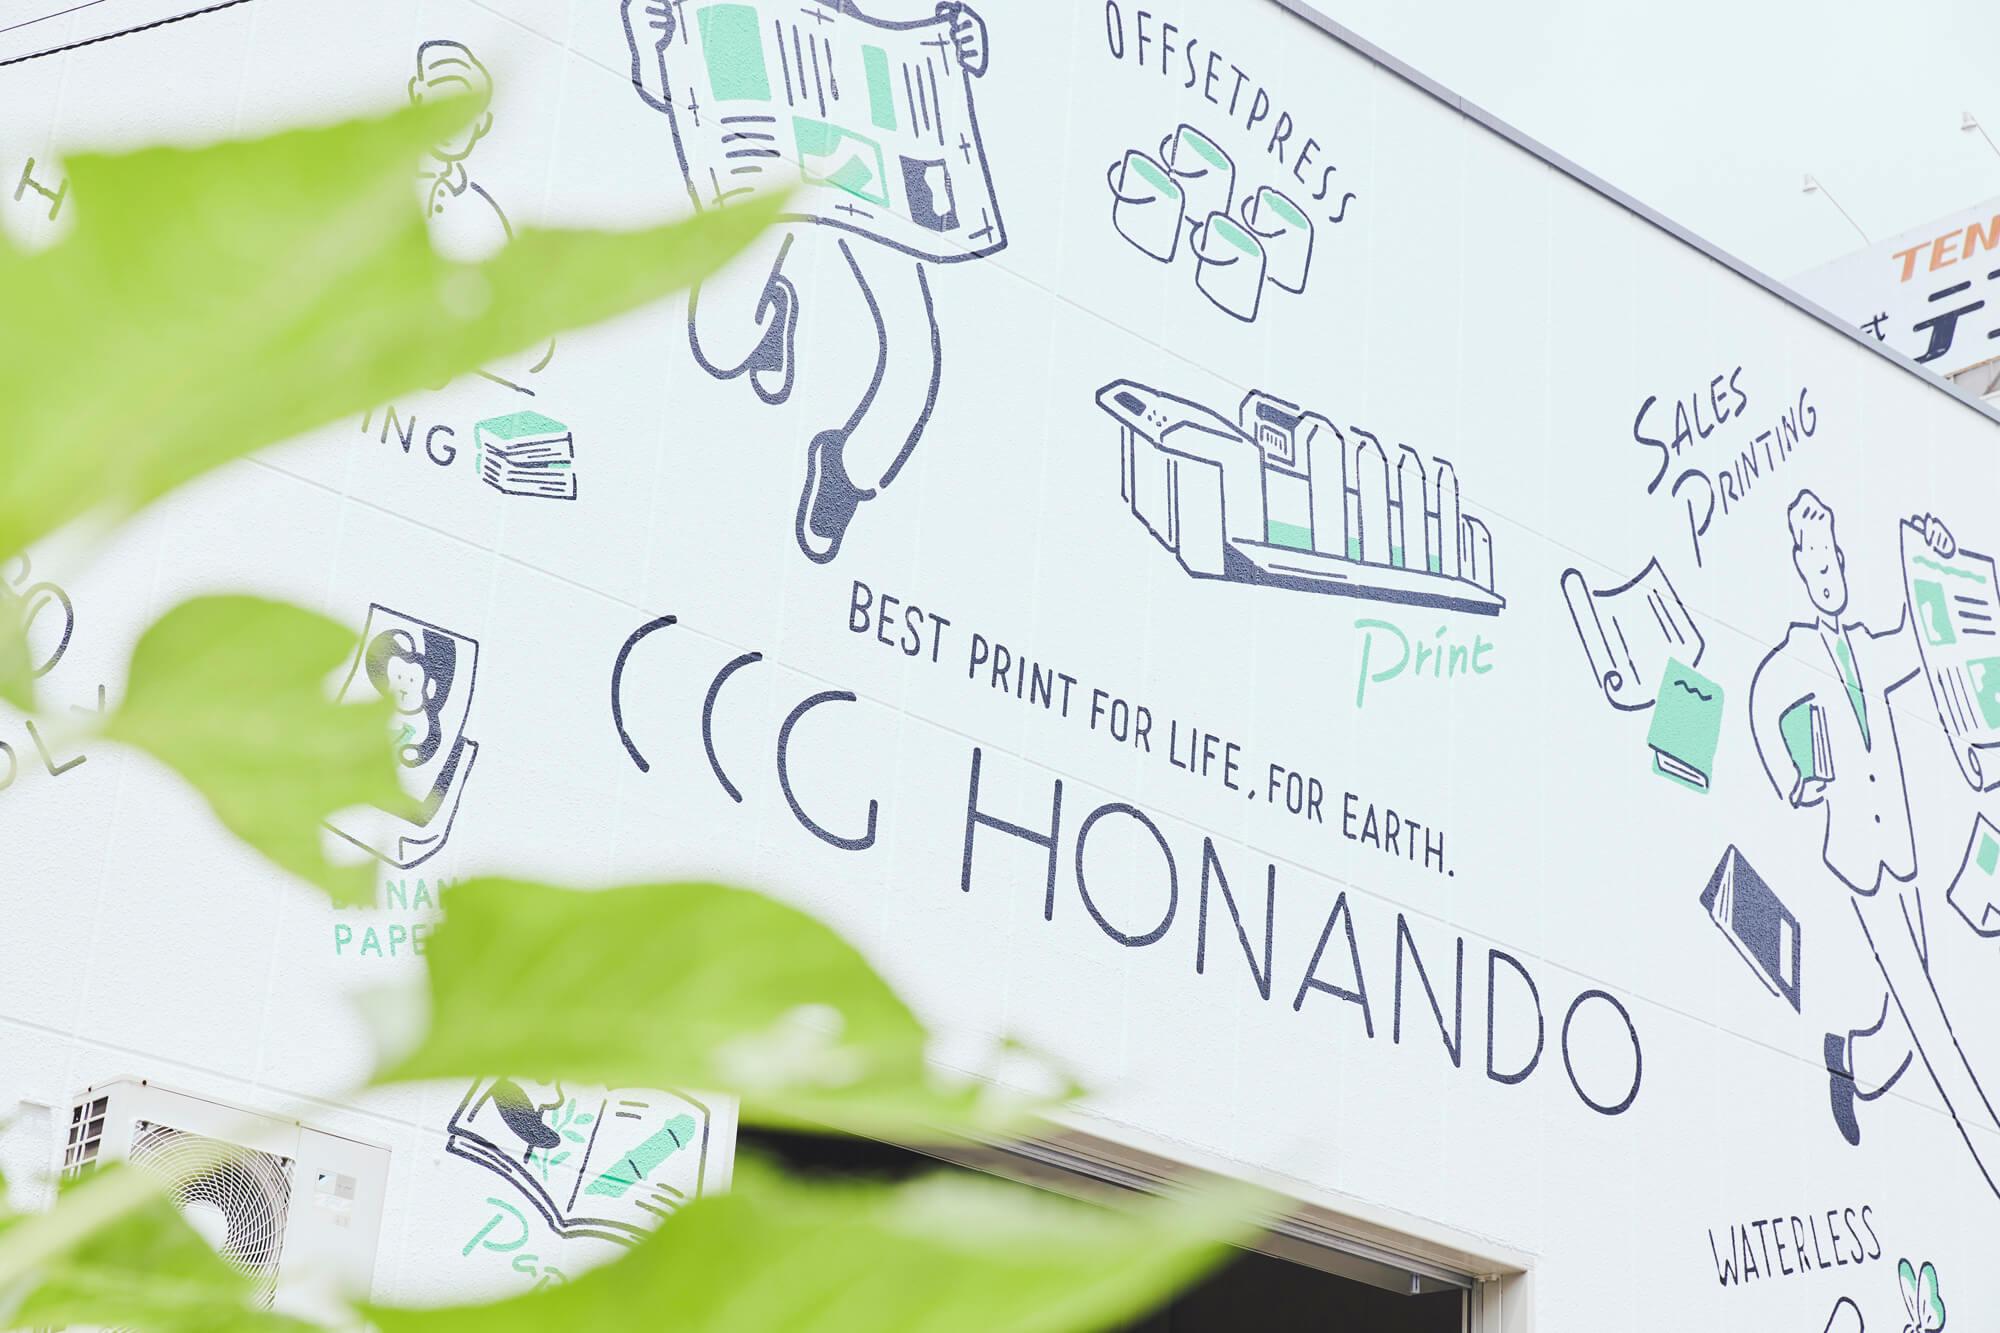 HONANDO外観と植物